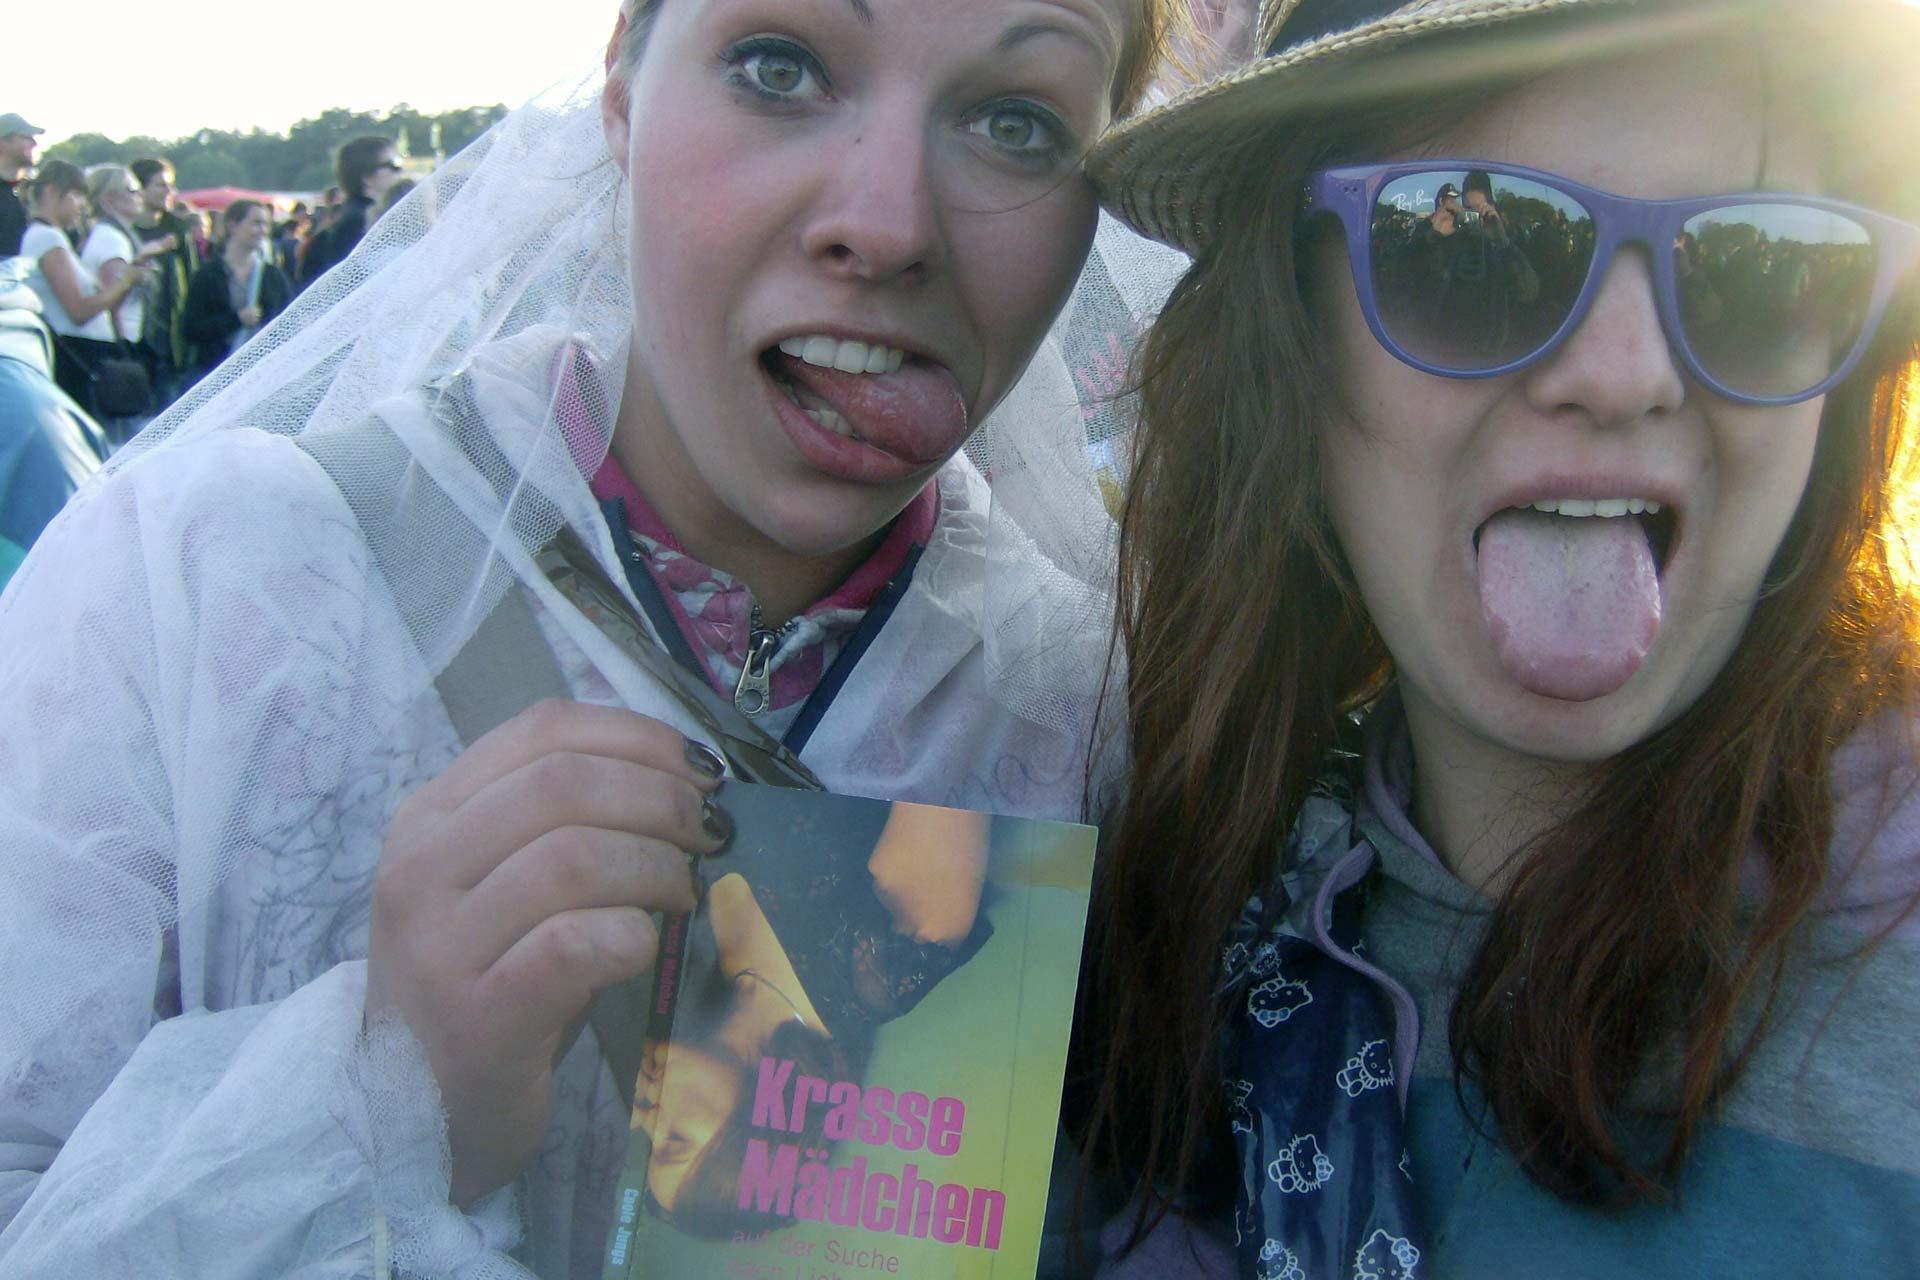 Hurricane Festival 2011: Krasse Mädchen